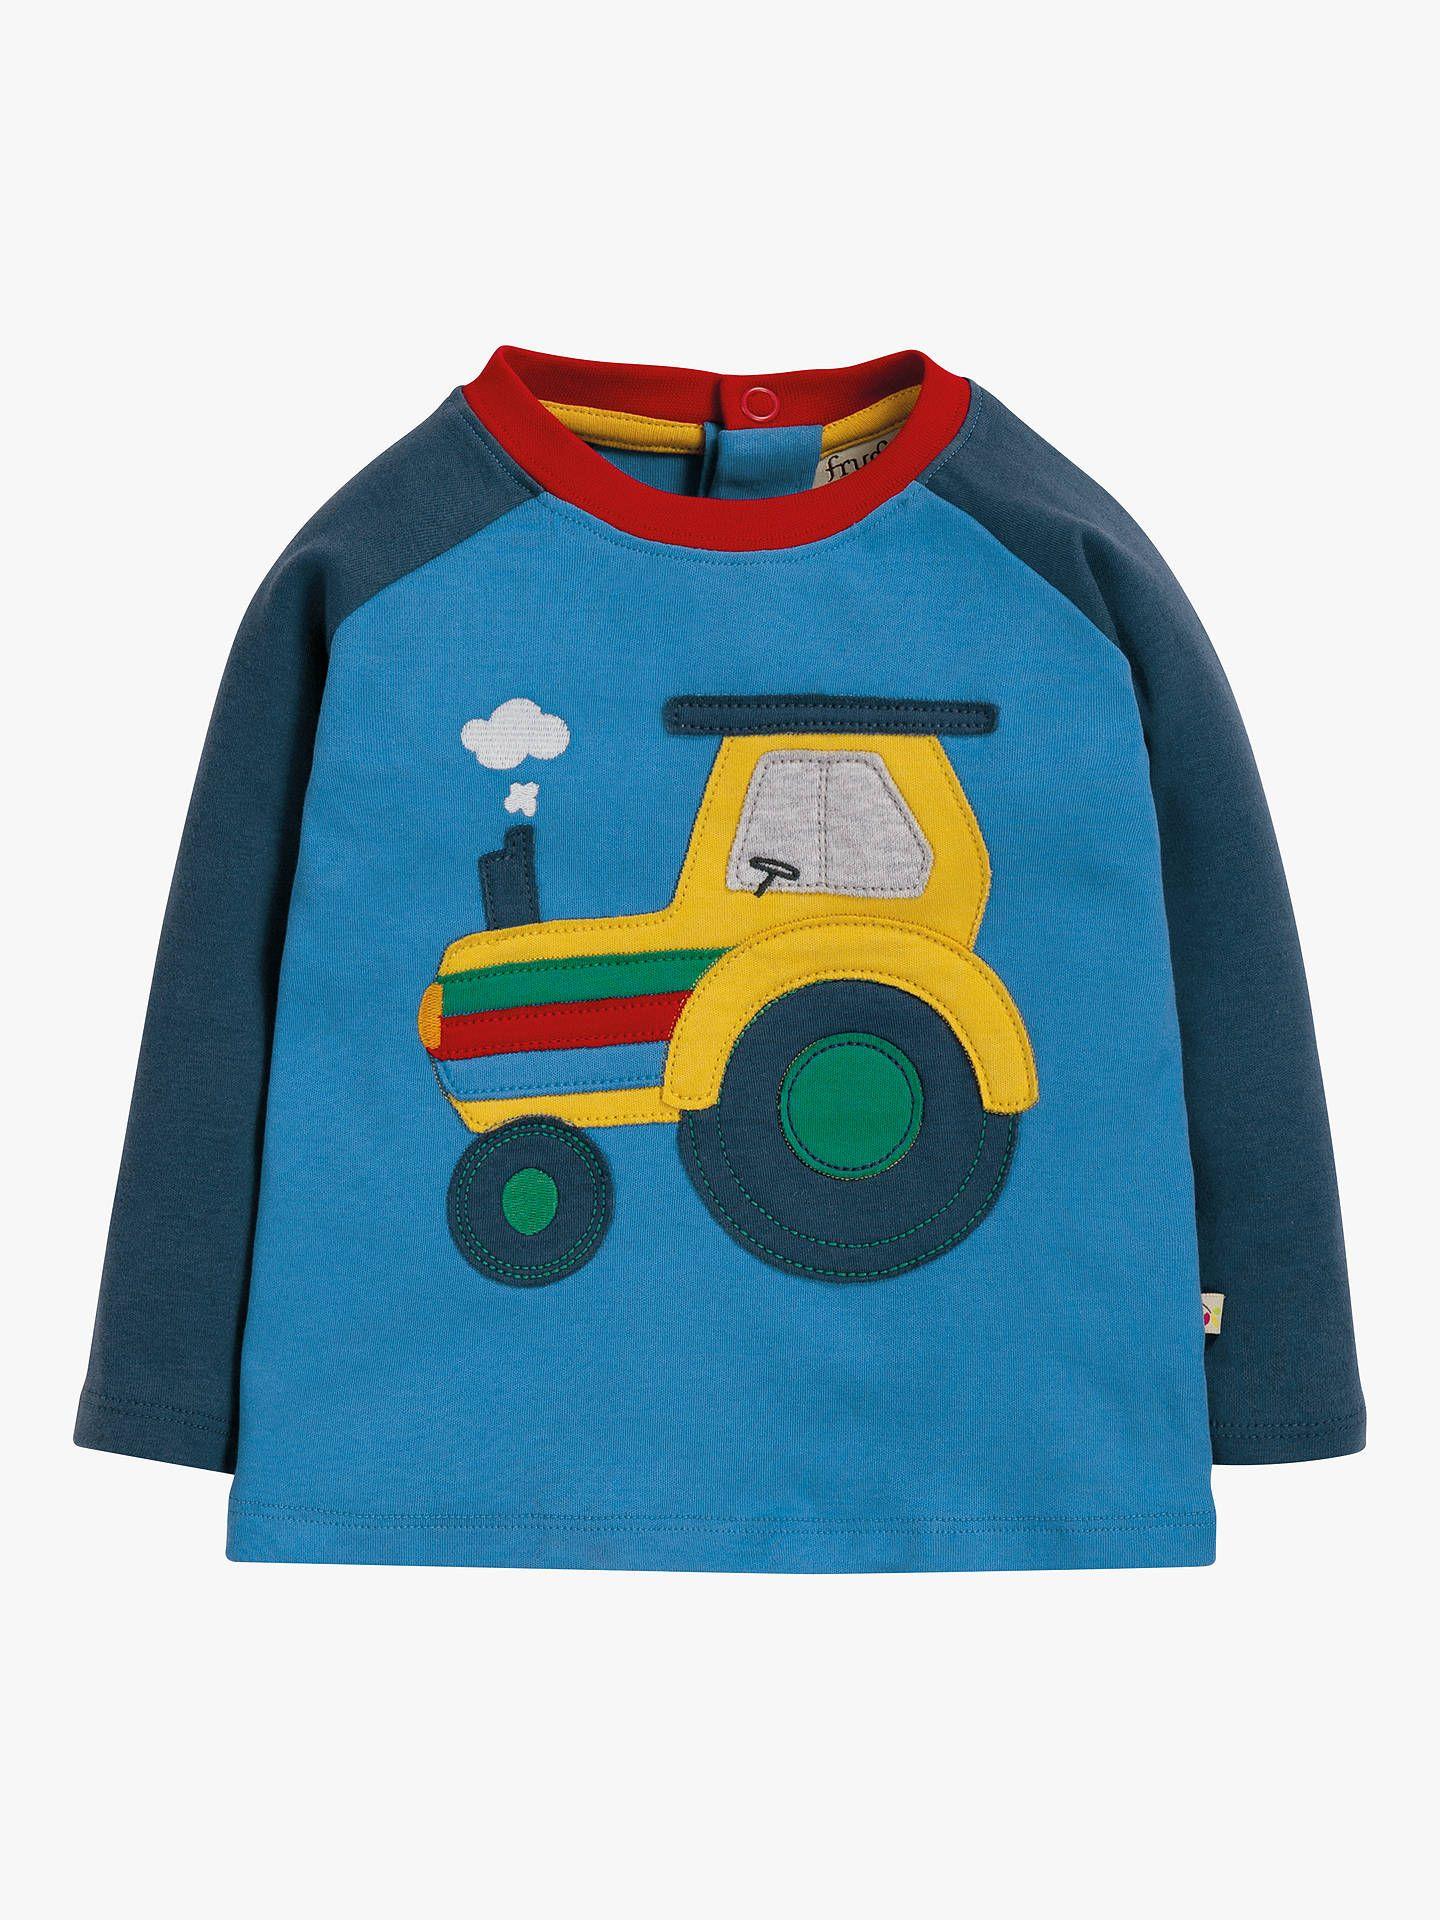 EZB Childrens Unisex Cars Windbreaker Jacket